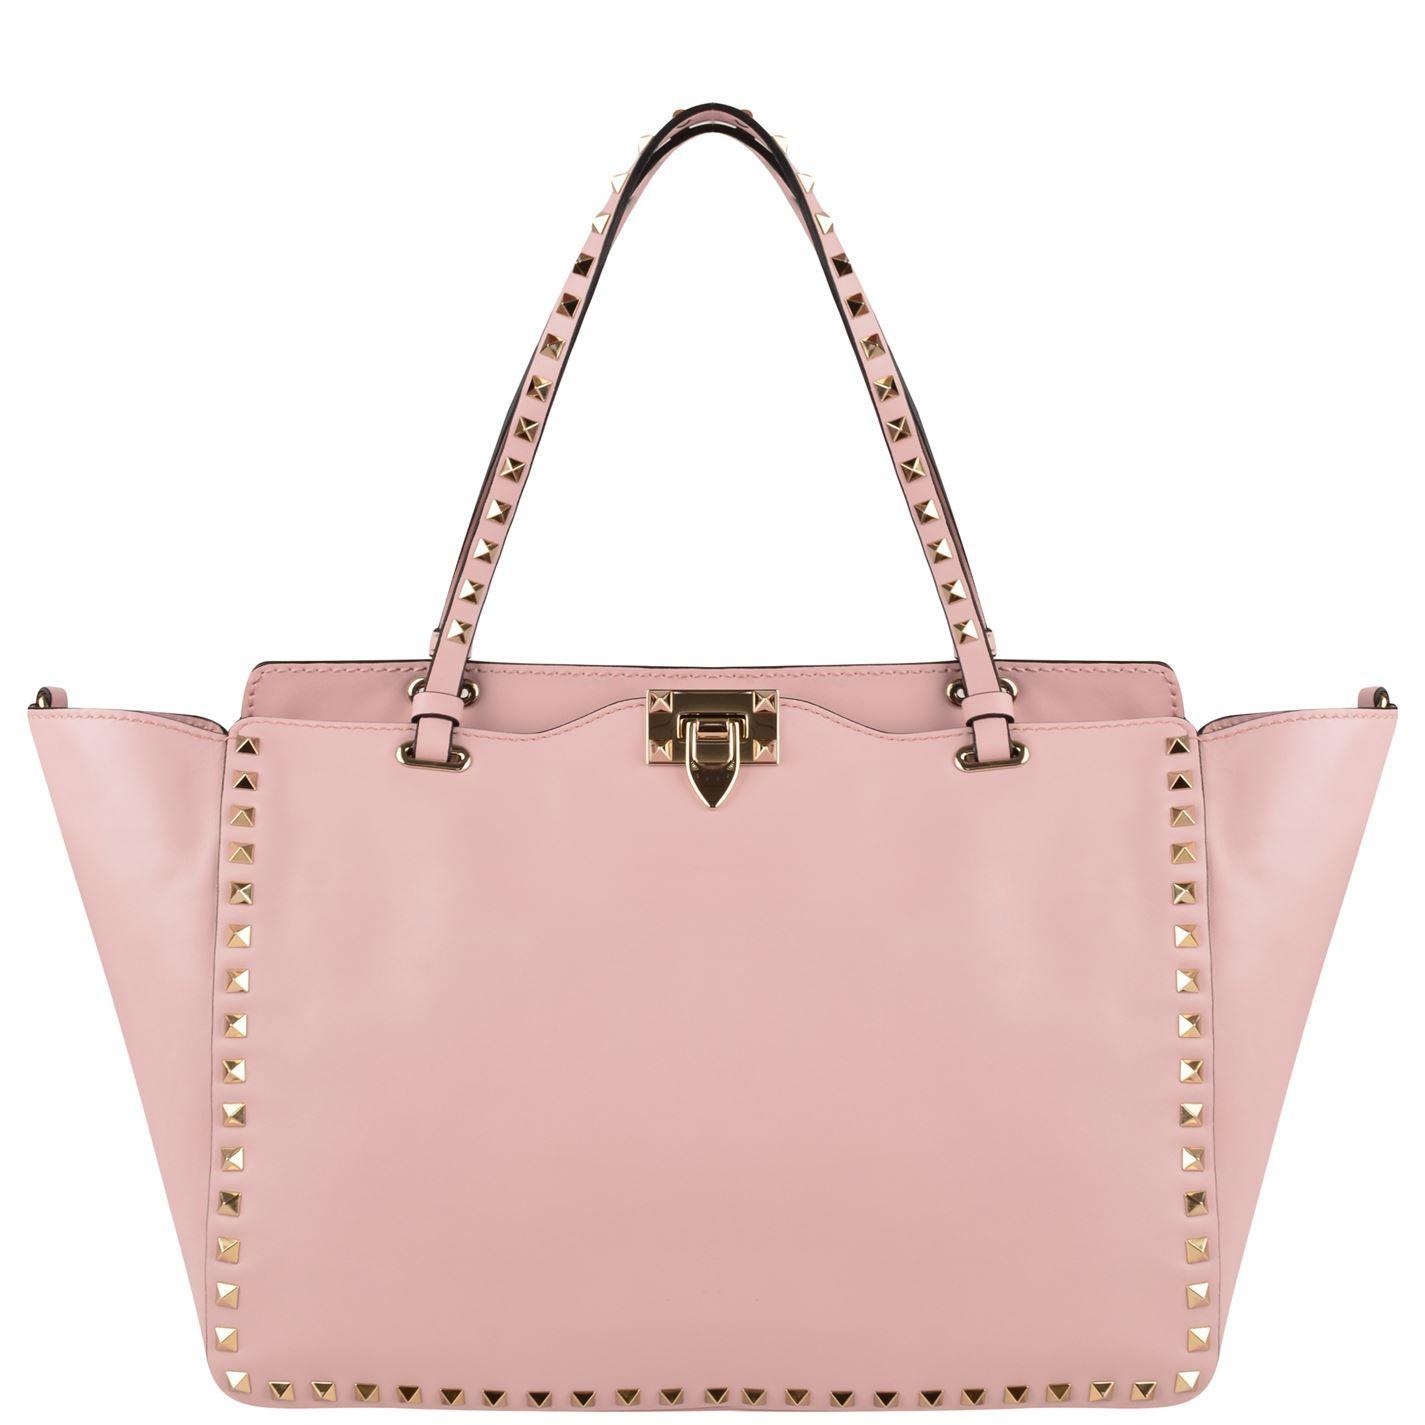 Valentino   Rockstud Wing Tote Bag